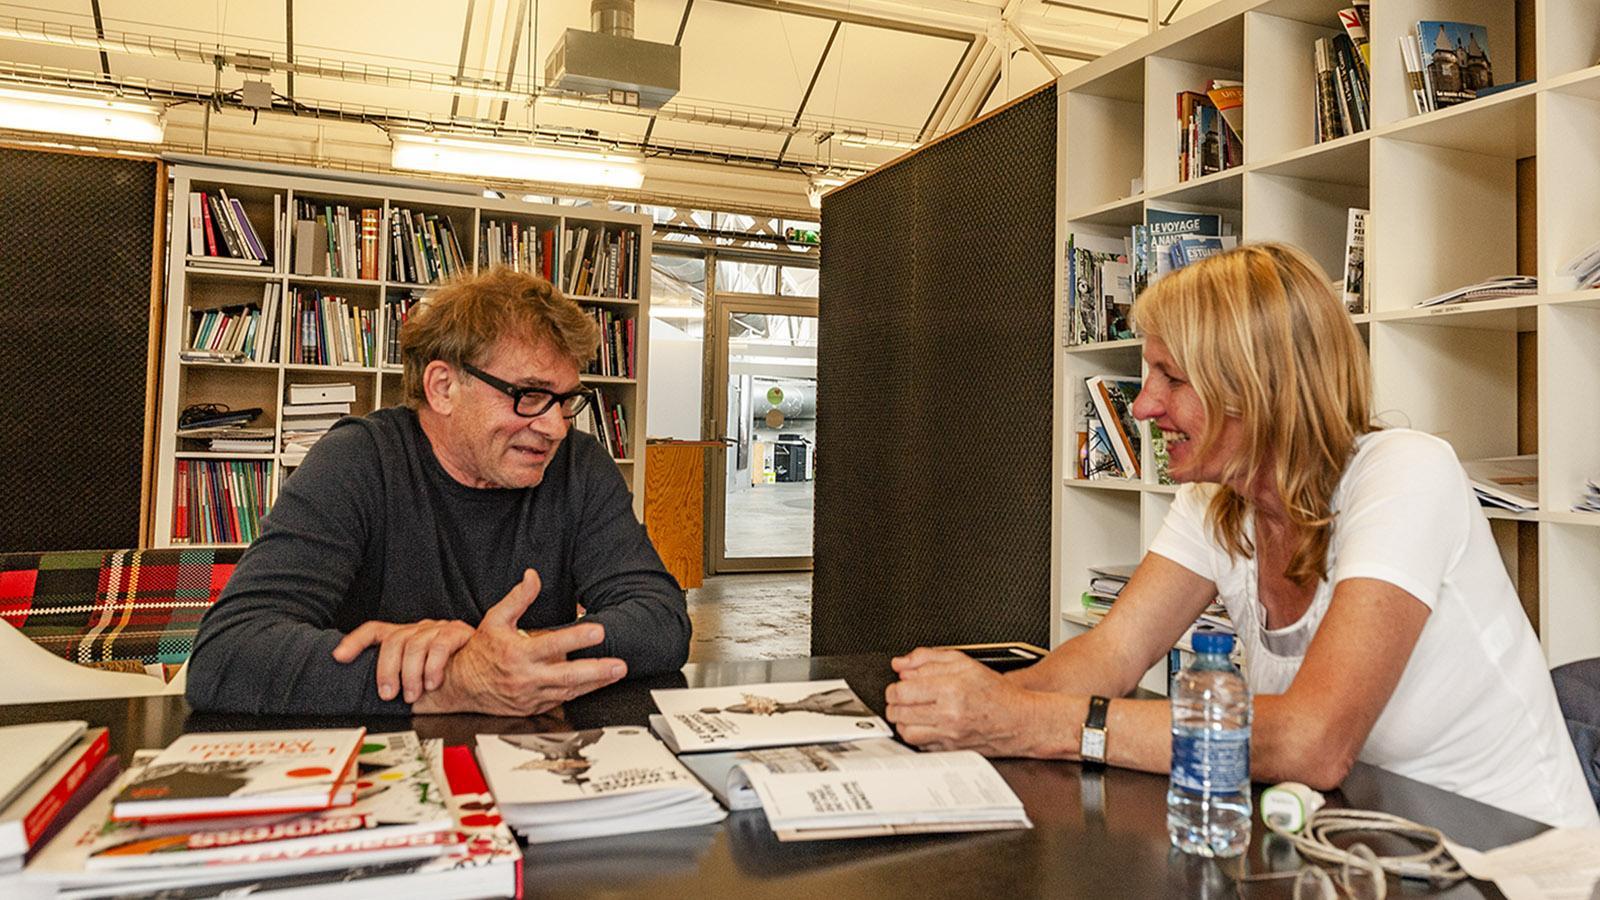 Nantes: Jean Blaise im Interview mit Hilke Maunder. Foto: Hilke Maunder